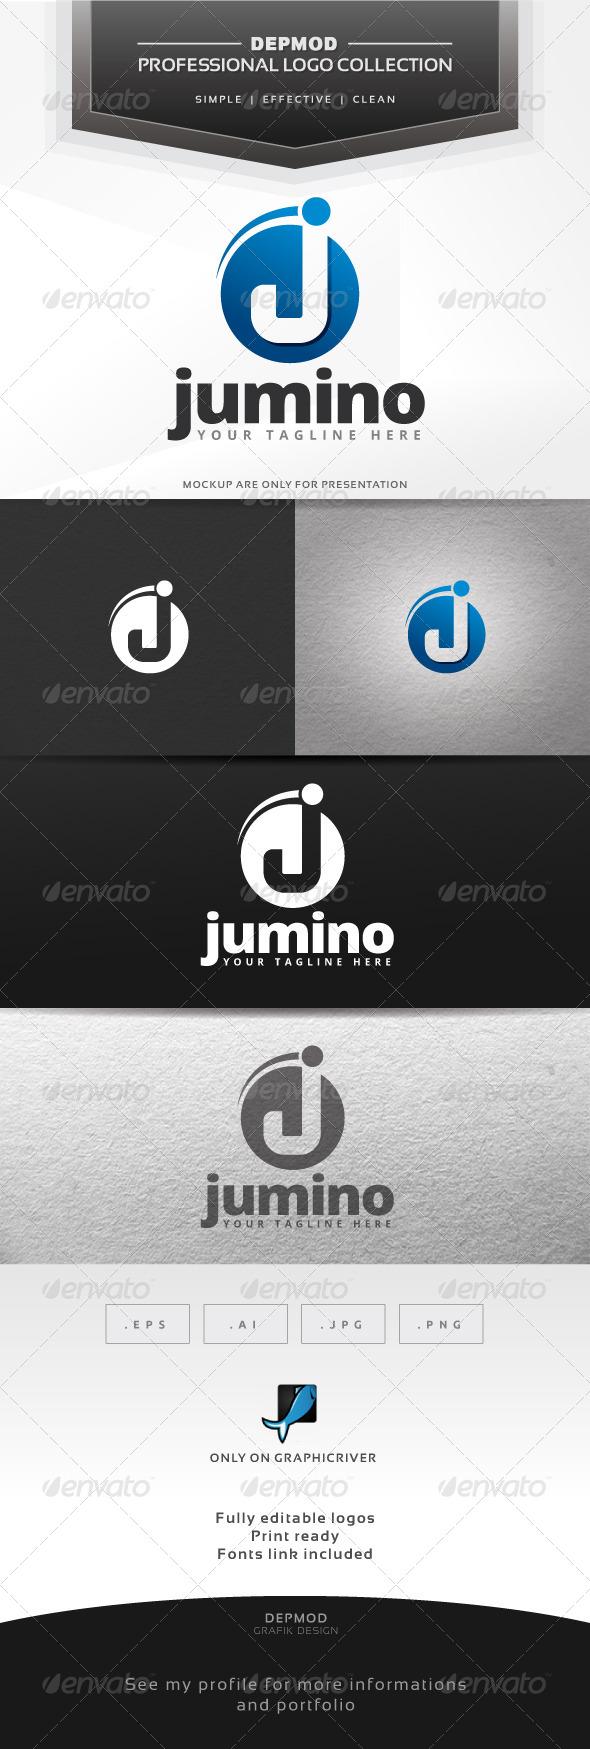 GraphicRiver Jumino Logo 6417977